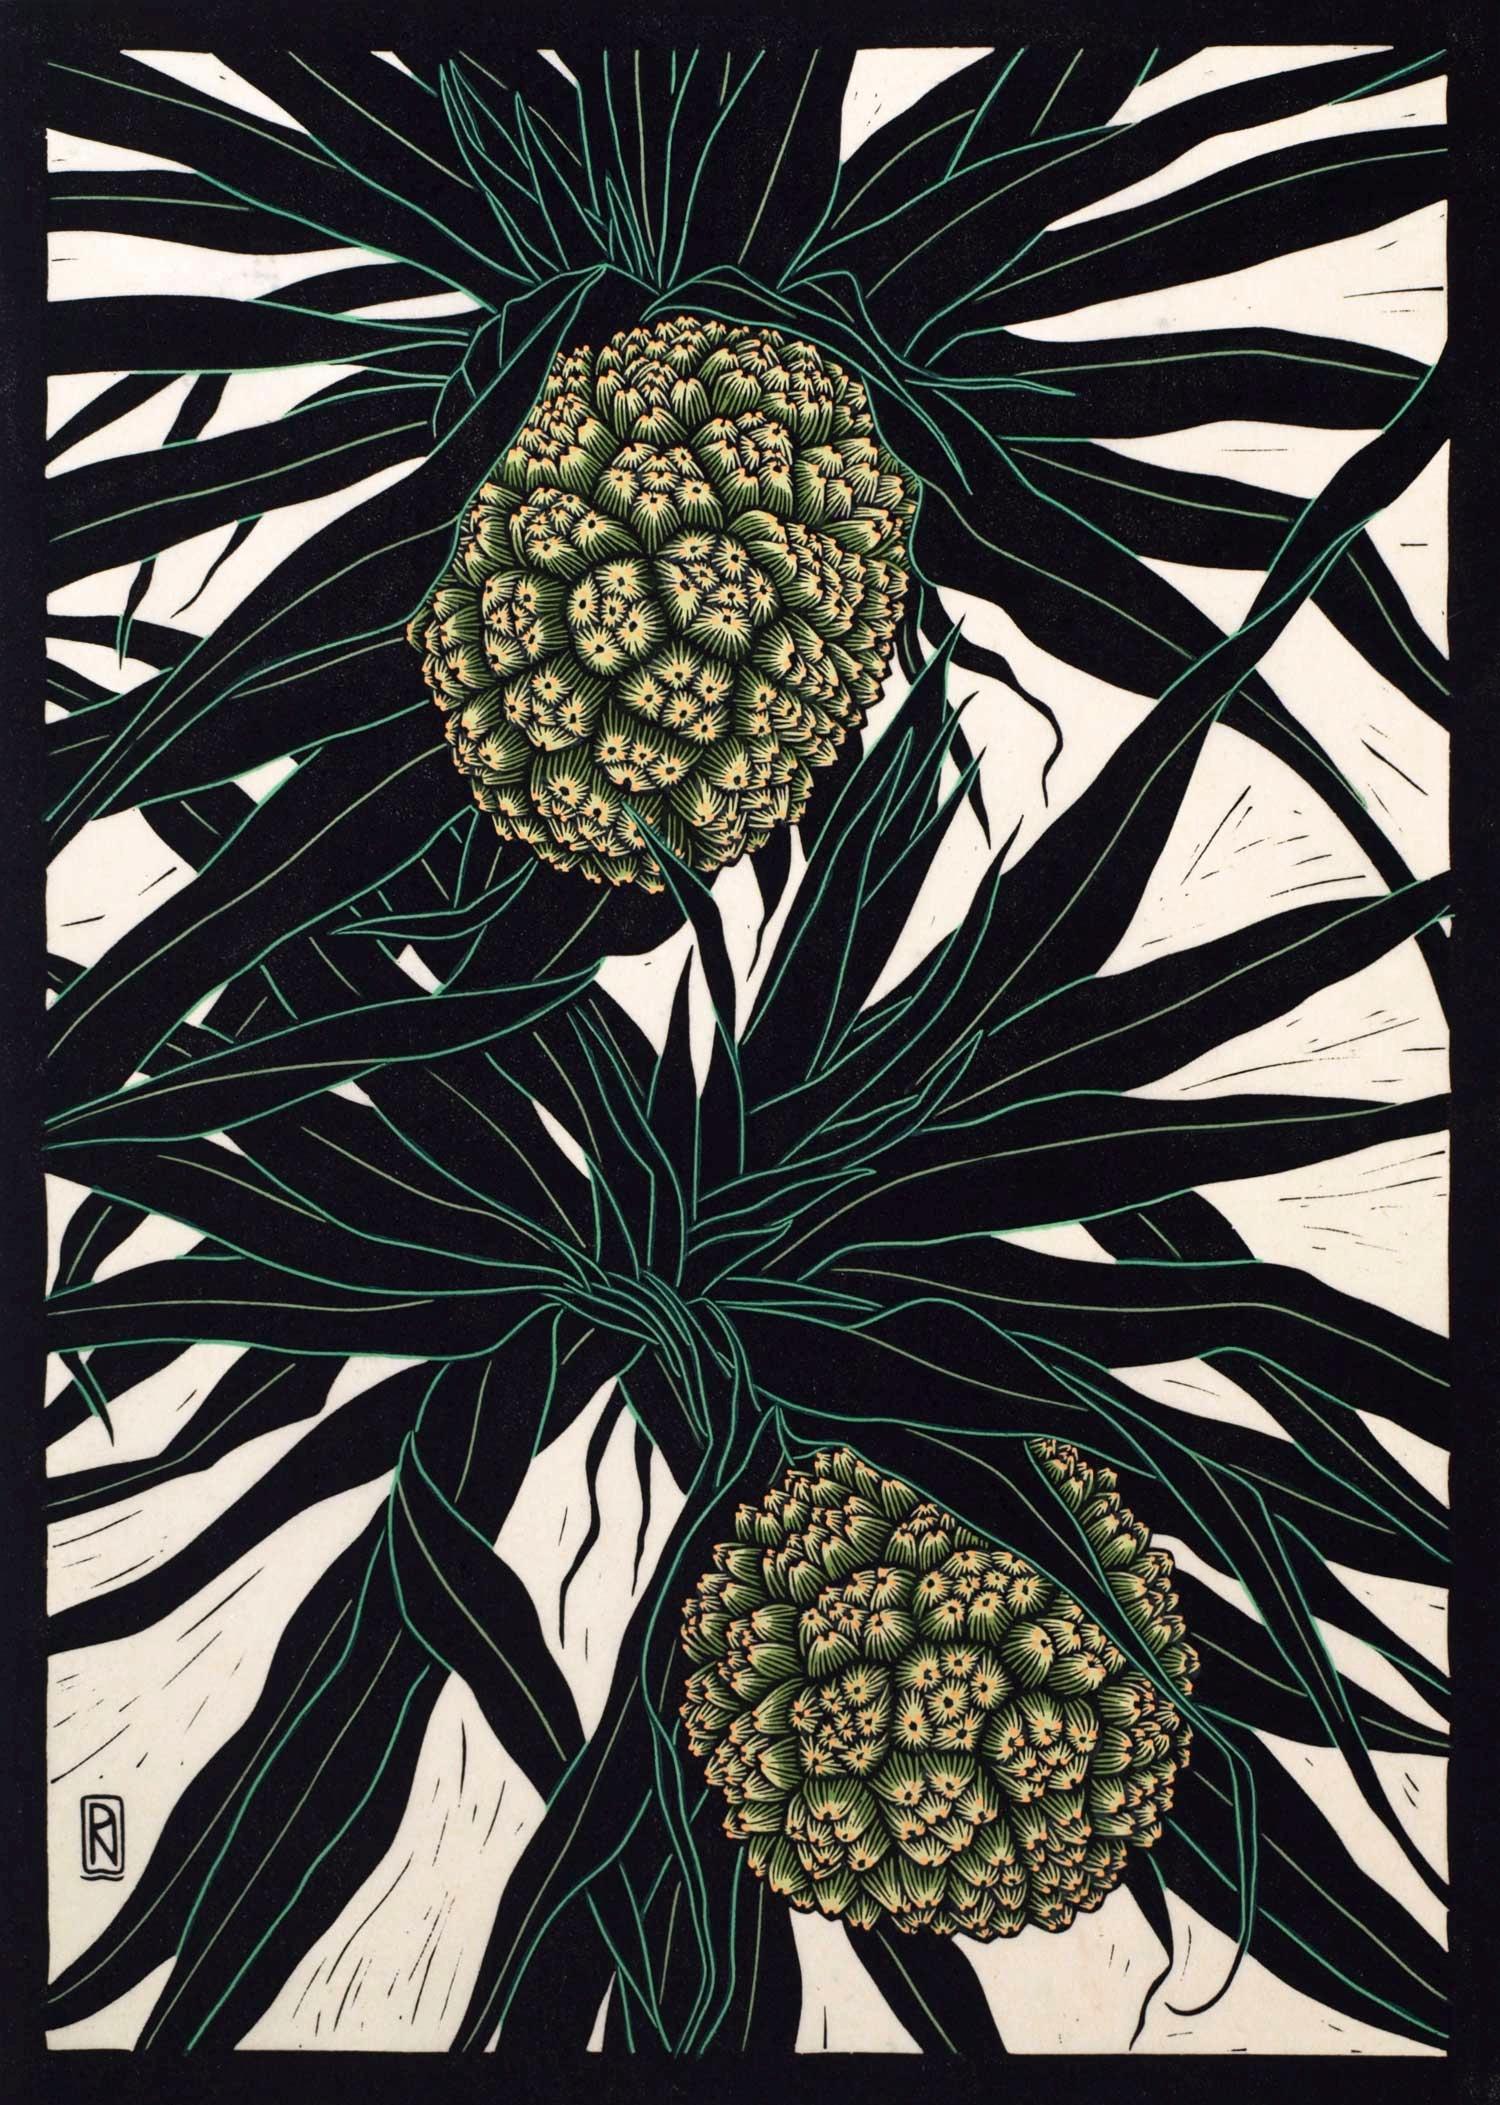 PANDANUS tree FRUIT  49 X 35 CM, EDITION OF 50  HAND-COLOURED LINOCUT ON HANDMADE JAPANESE PAPER  $1,100